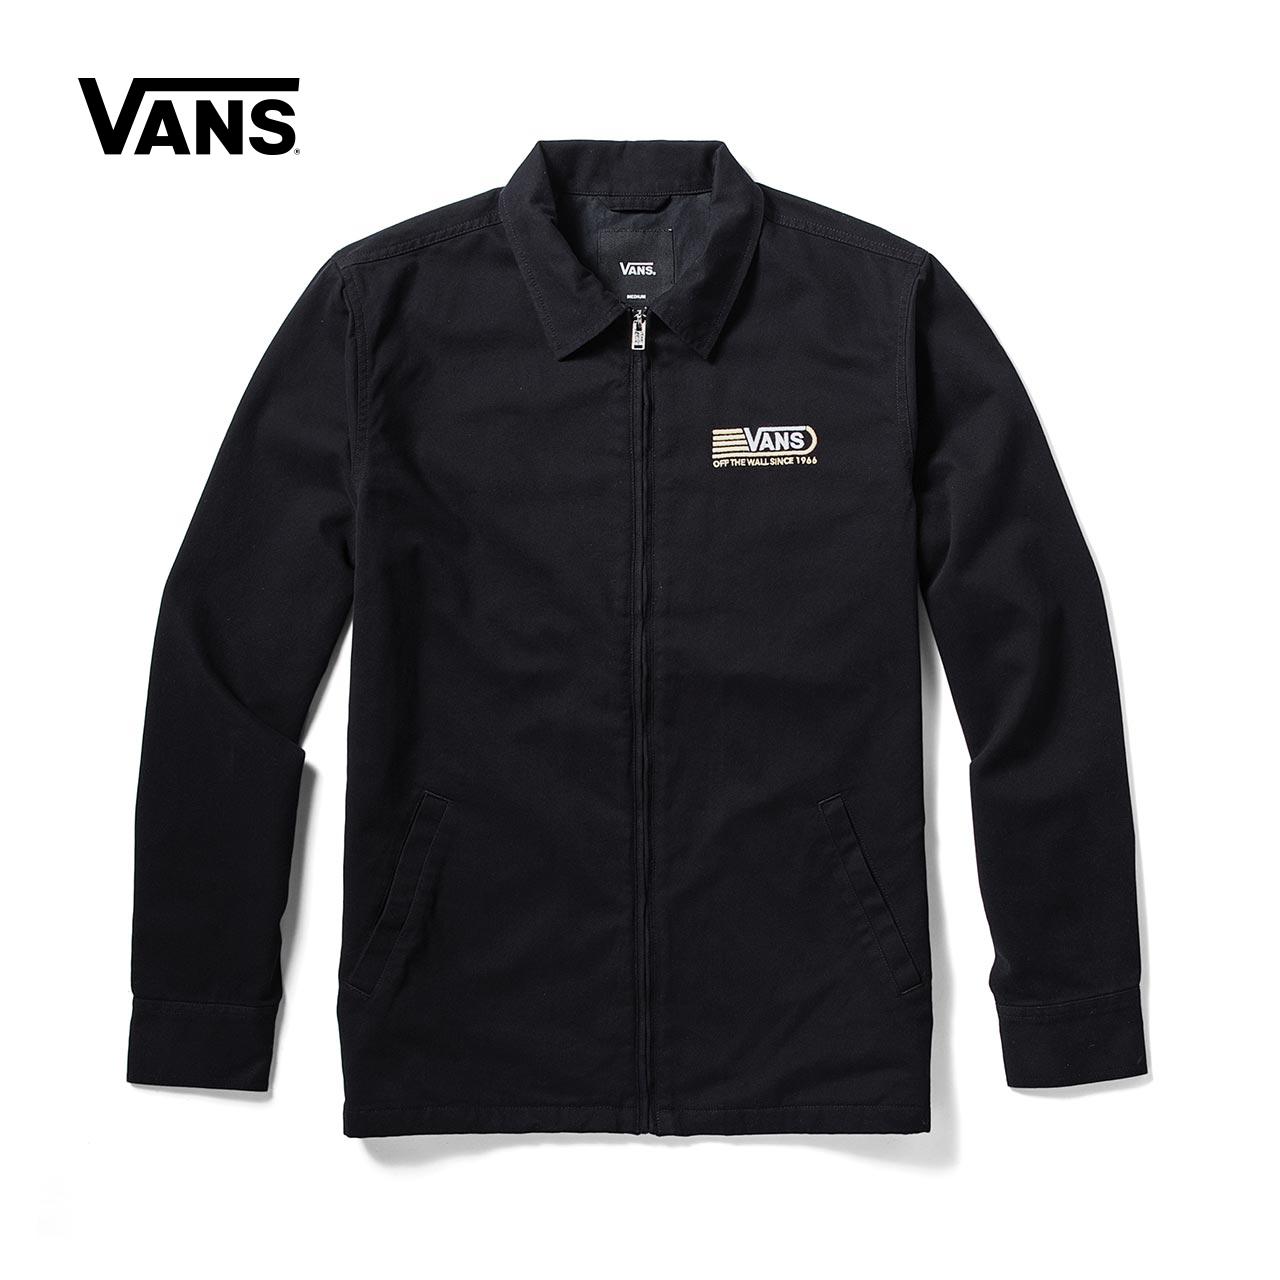 Vans 范斯官方秋季男款黑色夹克|VN0A3HOVBLK